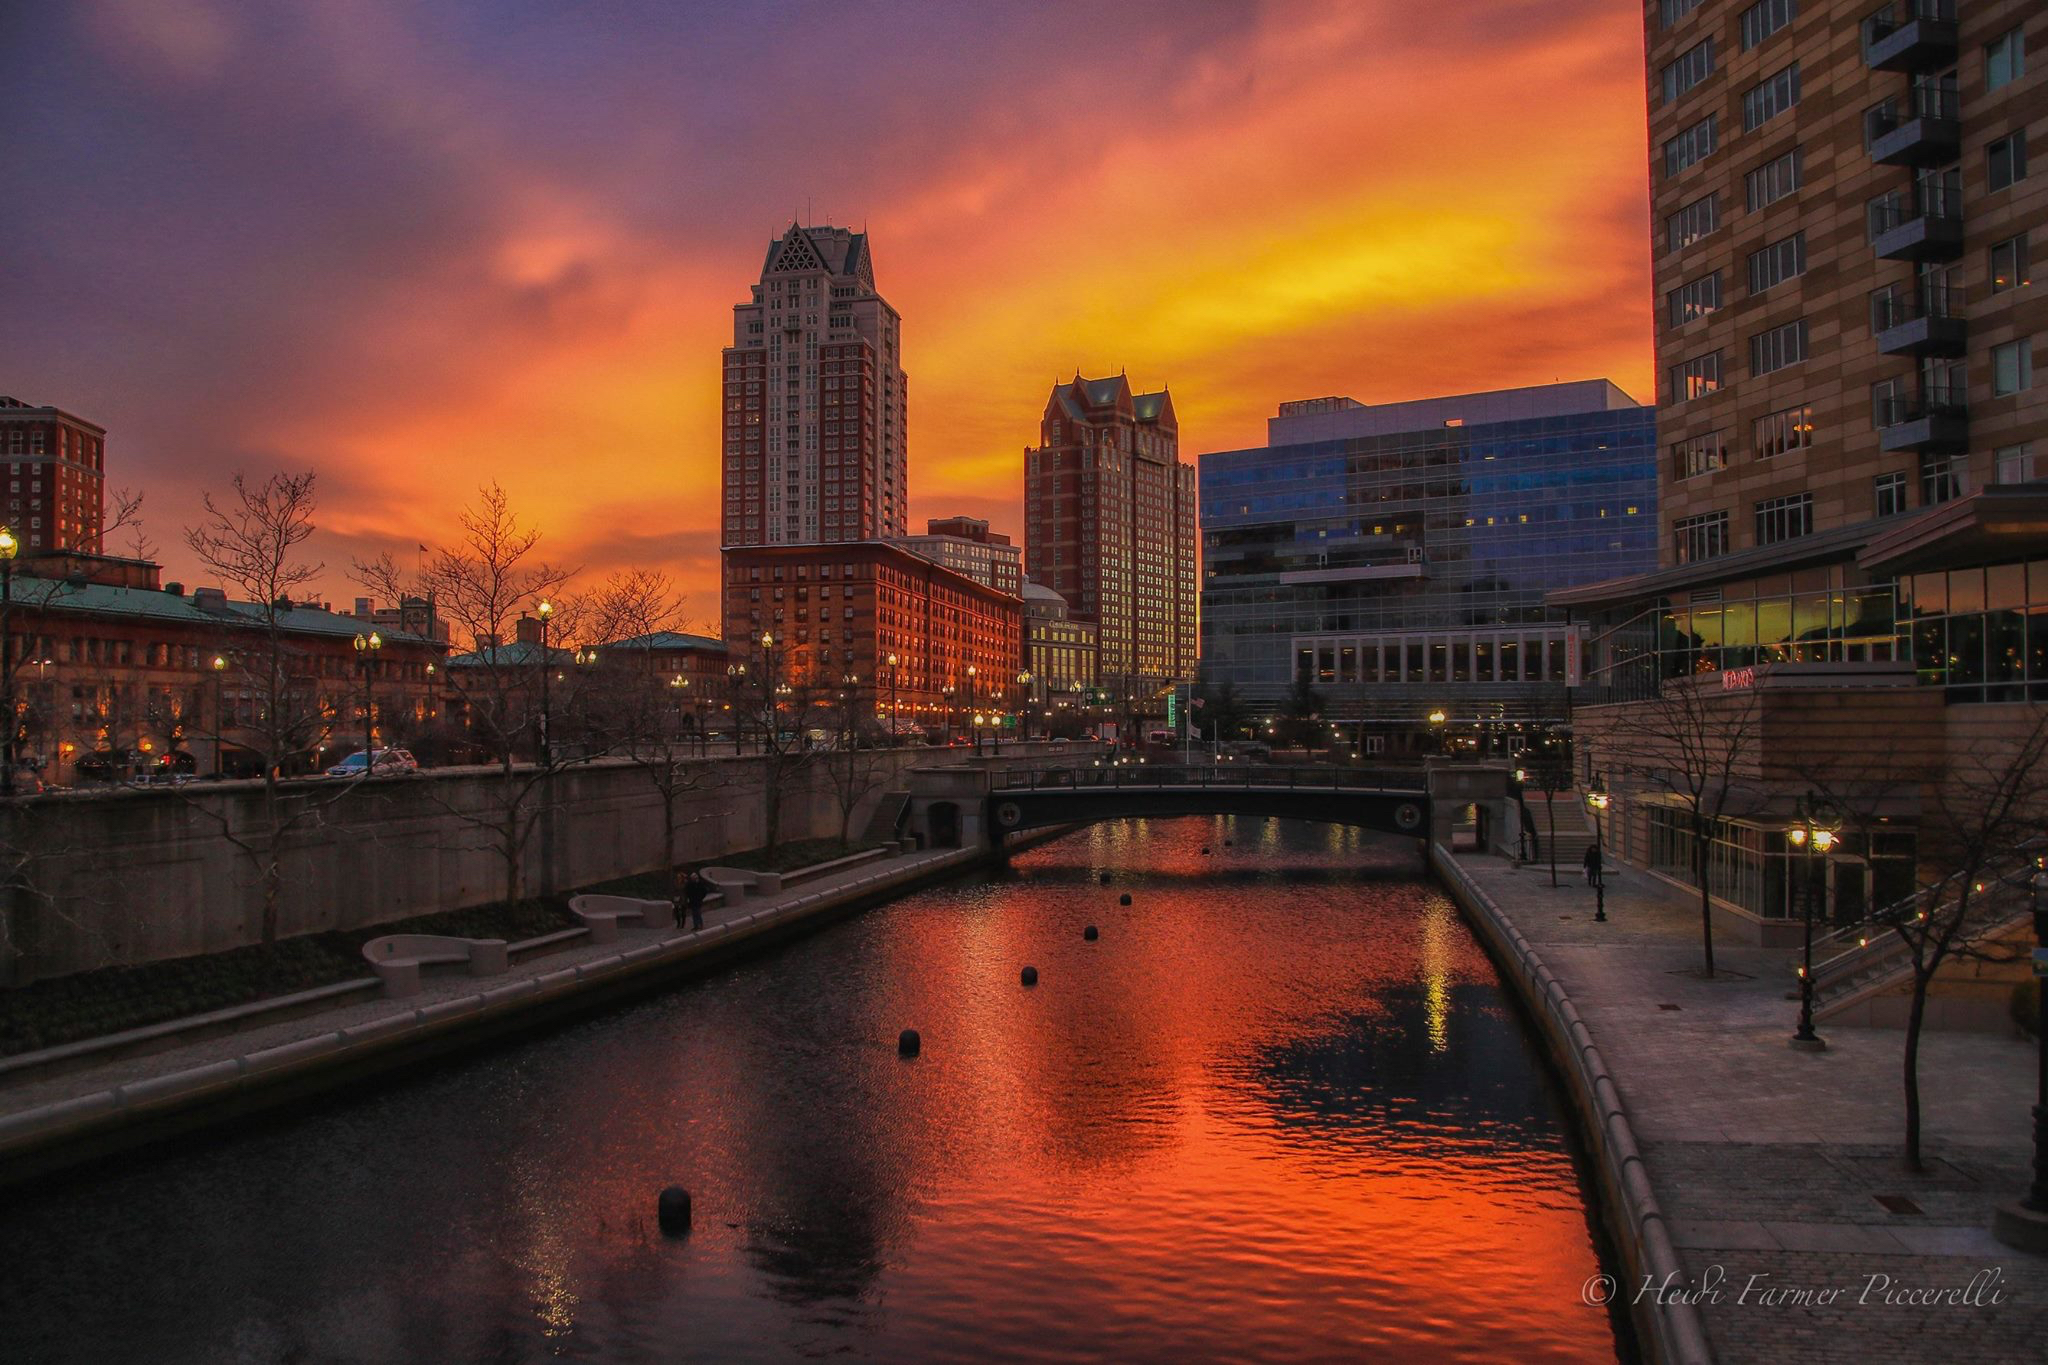 heidi's sunset.jpg